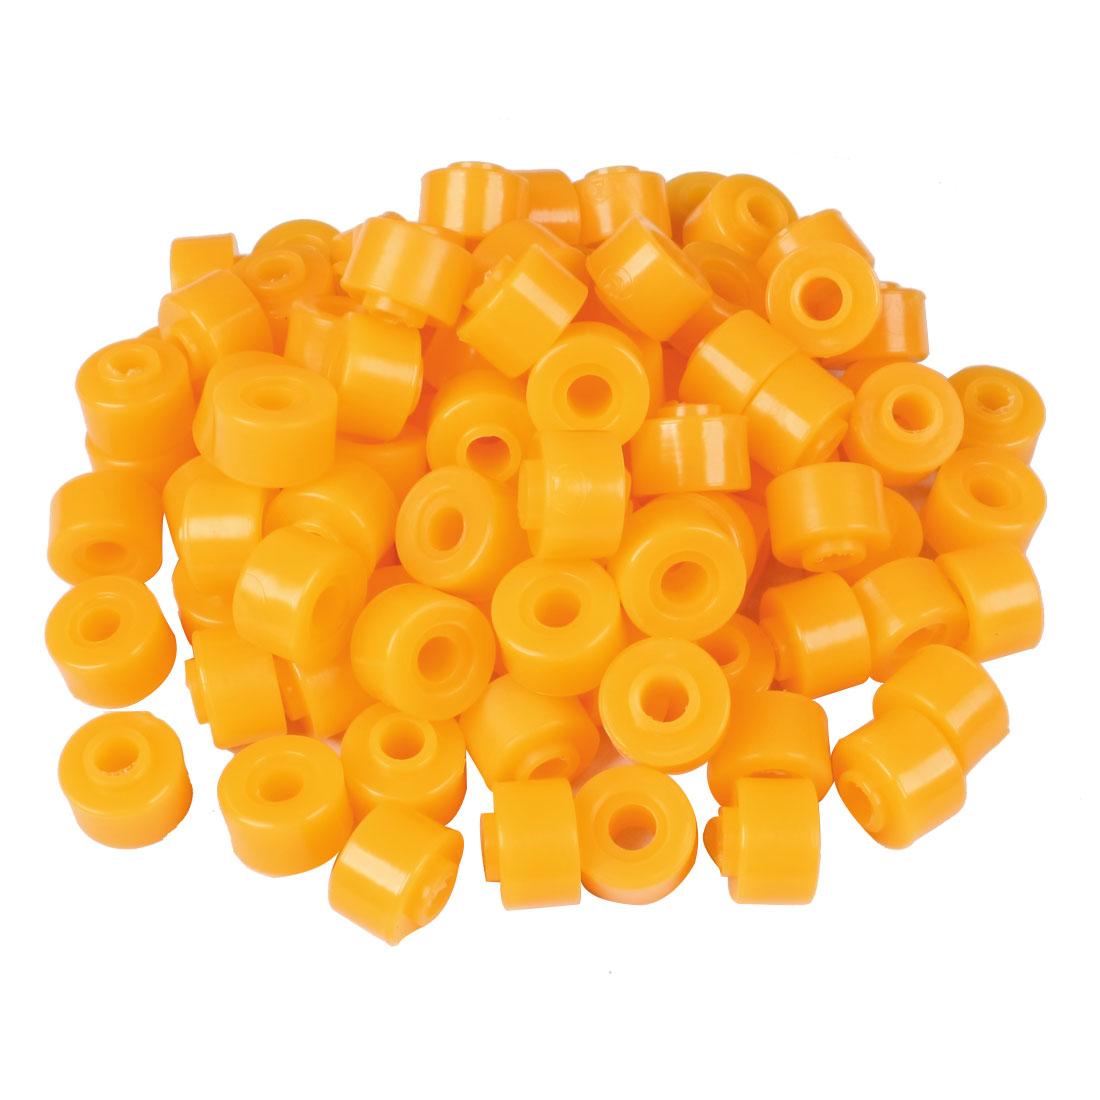 100 Pcs 27mm x 10mm x 20mm Car Rubber Shock Absorber Bush Damper Yellow